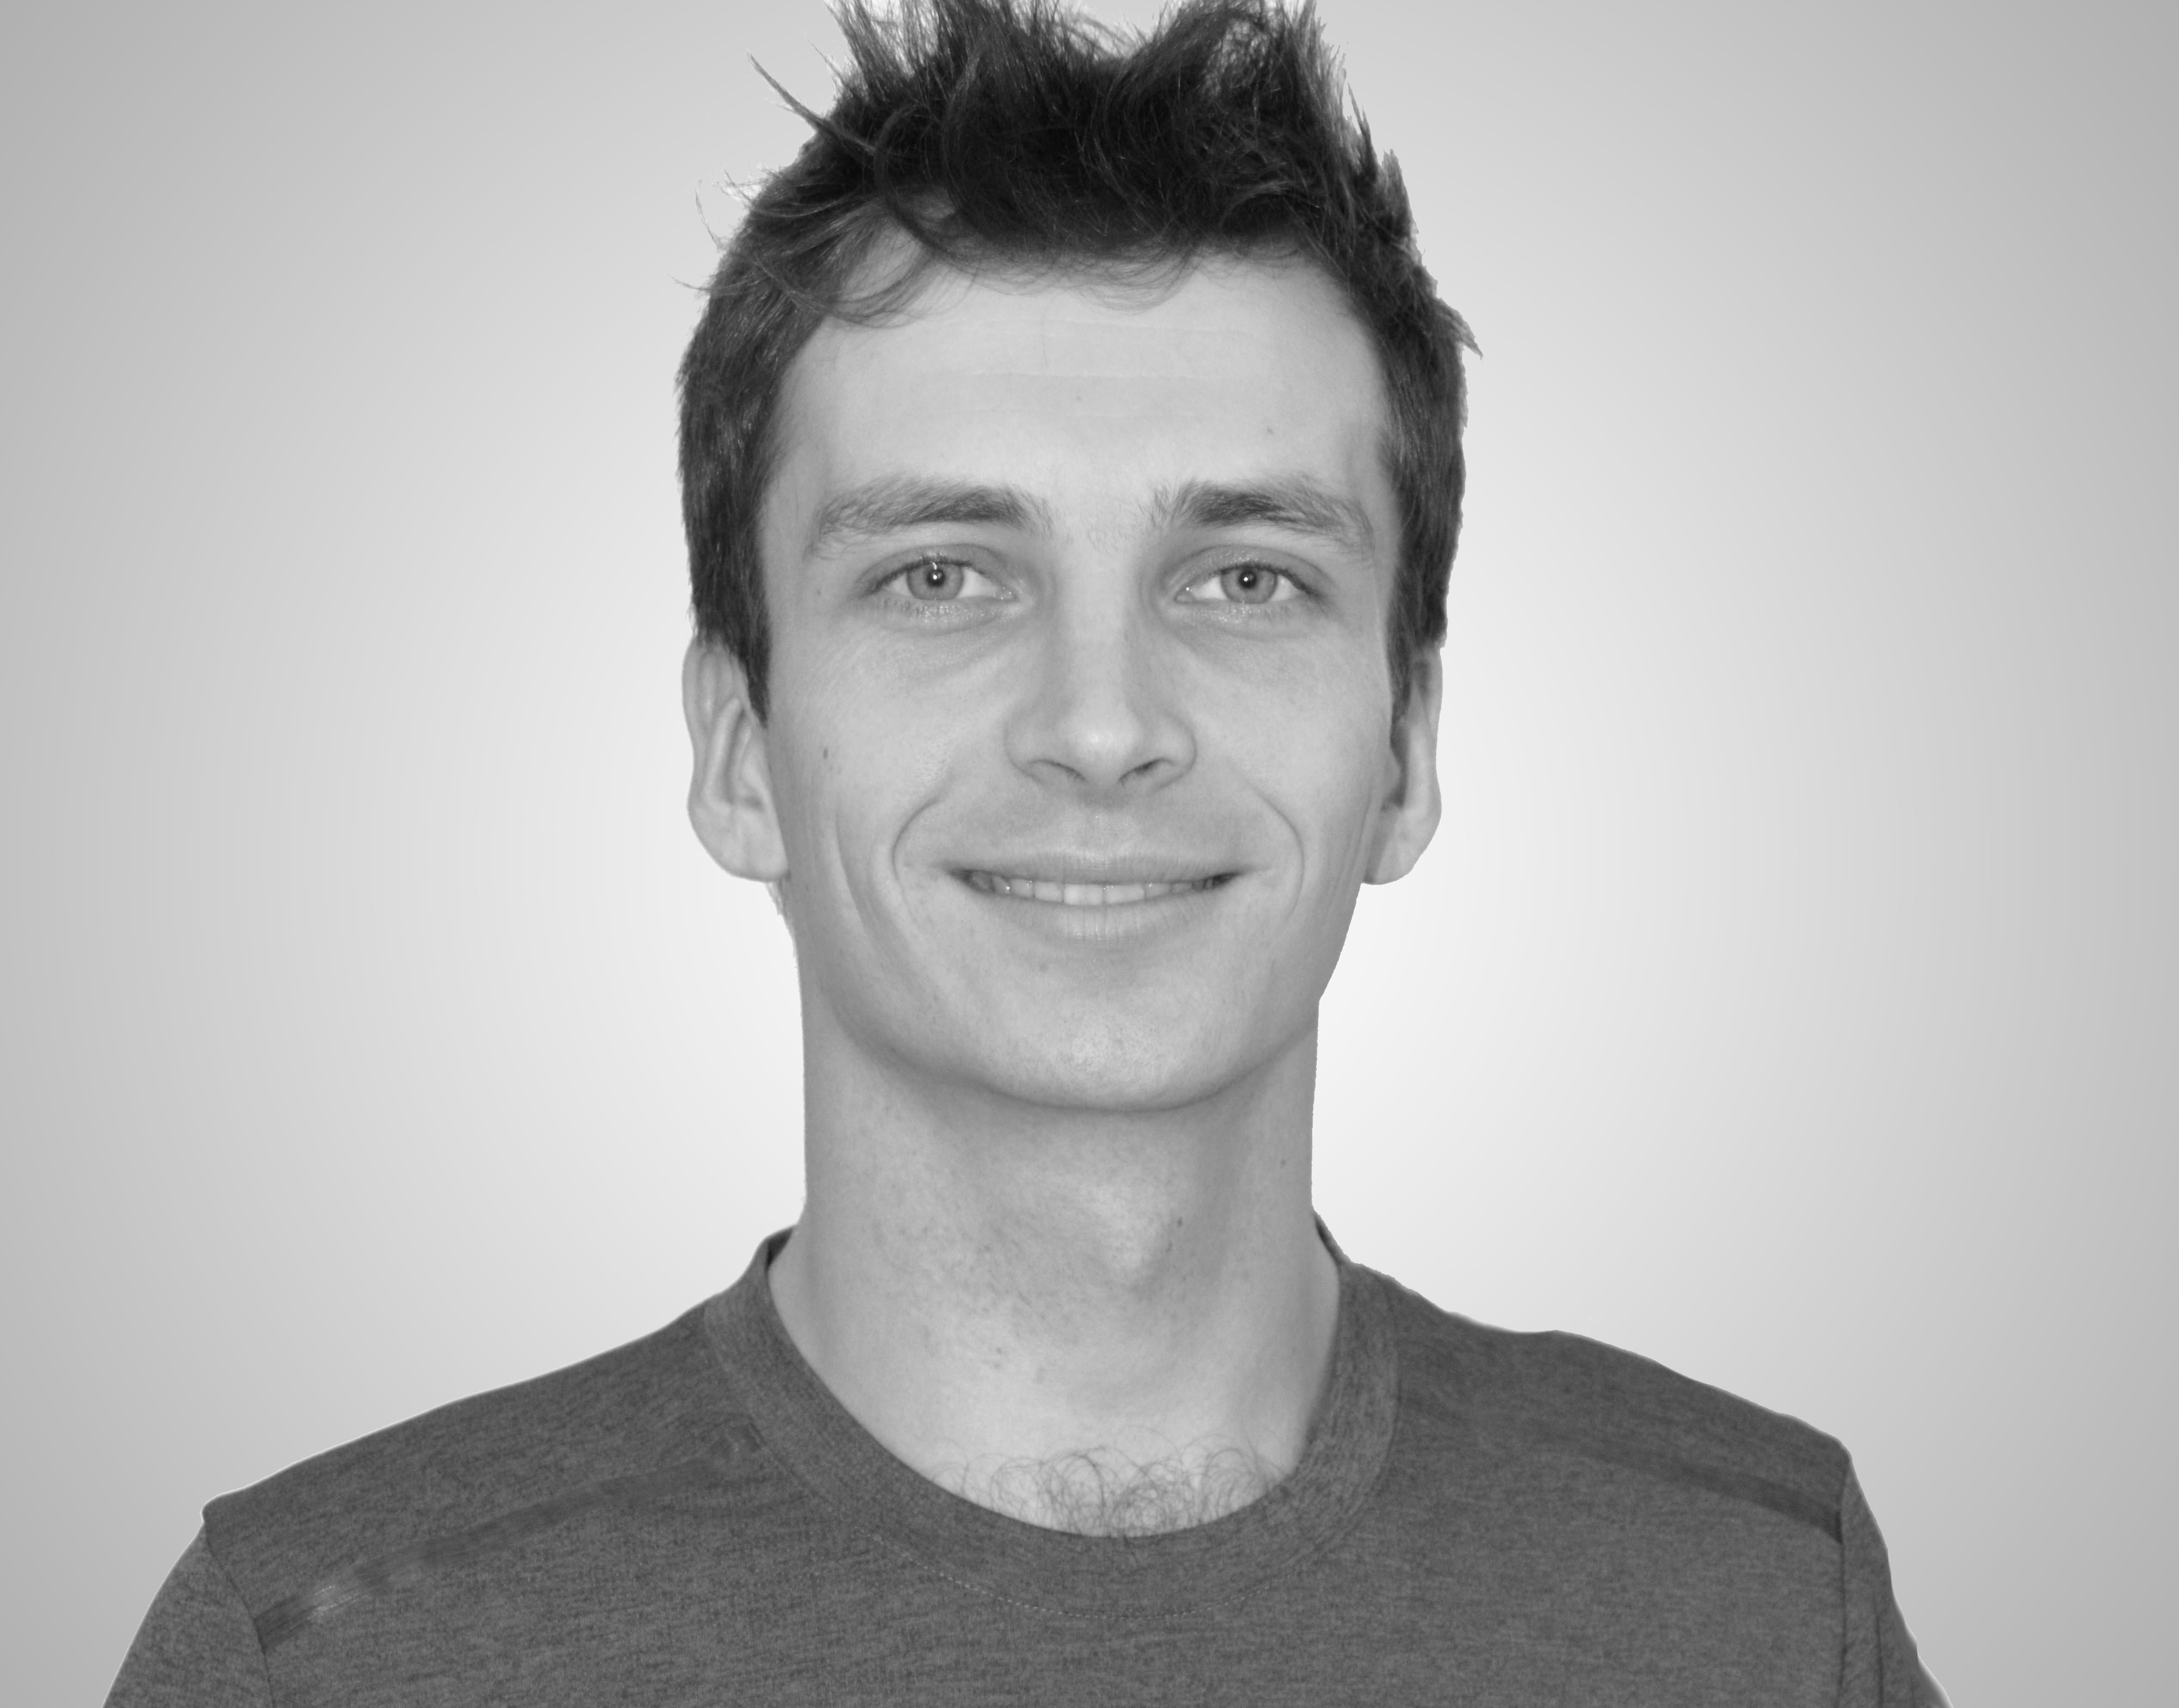 Martin Arezina